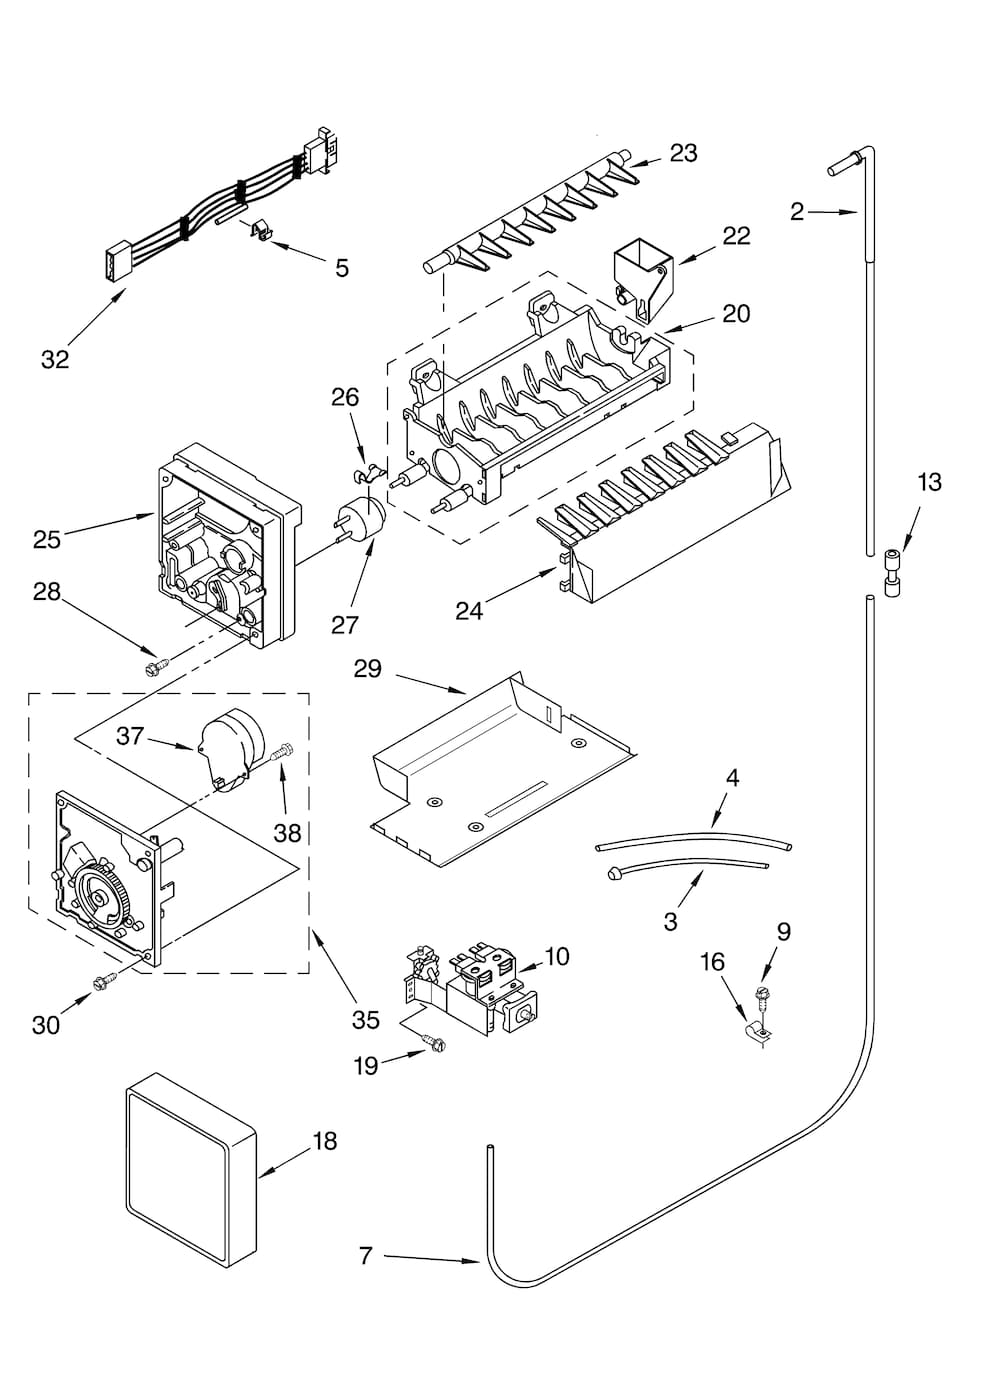 Wiring Database 2020  27 Kenmore Coldspot Model 106 Parts